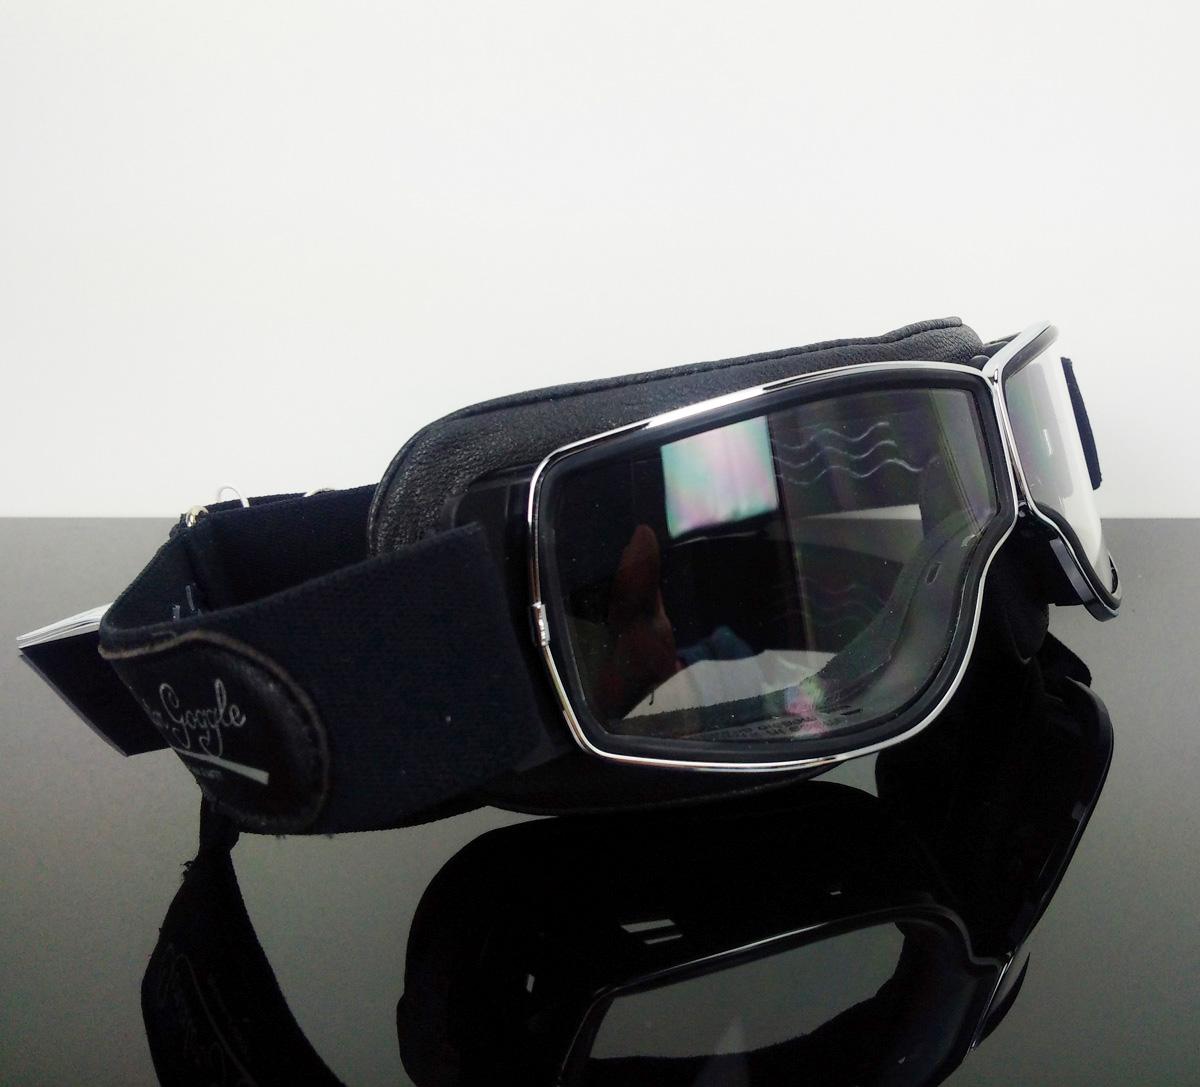 motorradbrille brille goggles lunettes occhiali aviator. Black Bedroom Furniture Sets. Home Design Ideas